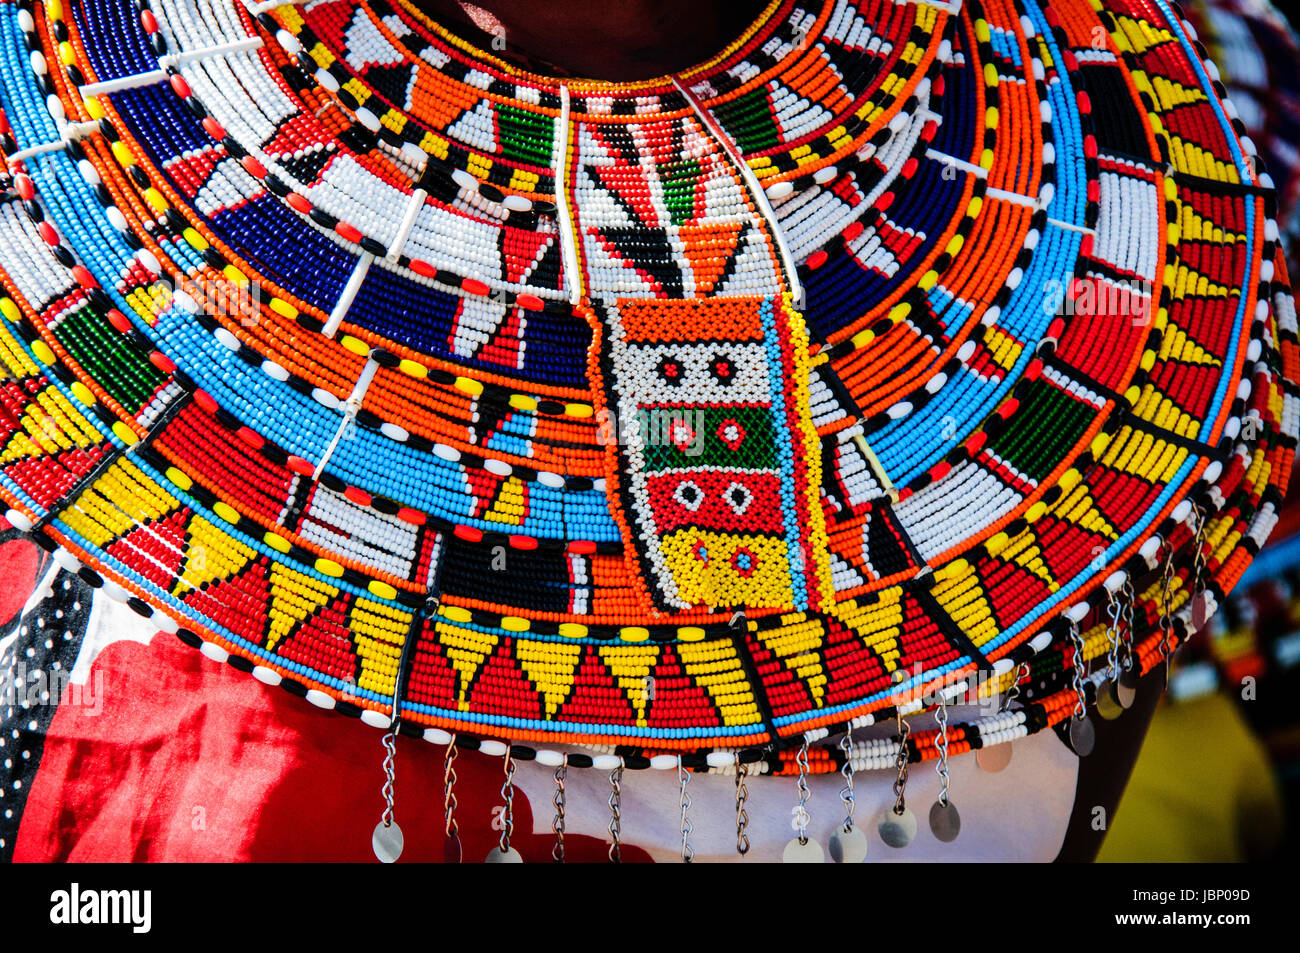 Colorful traditional beaded necklace worn by Samburu Maasai women in Northern Kenya, East Africa - Stock Image